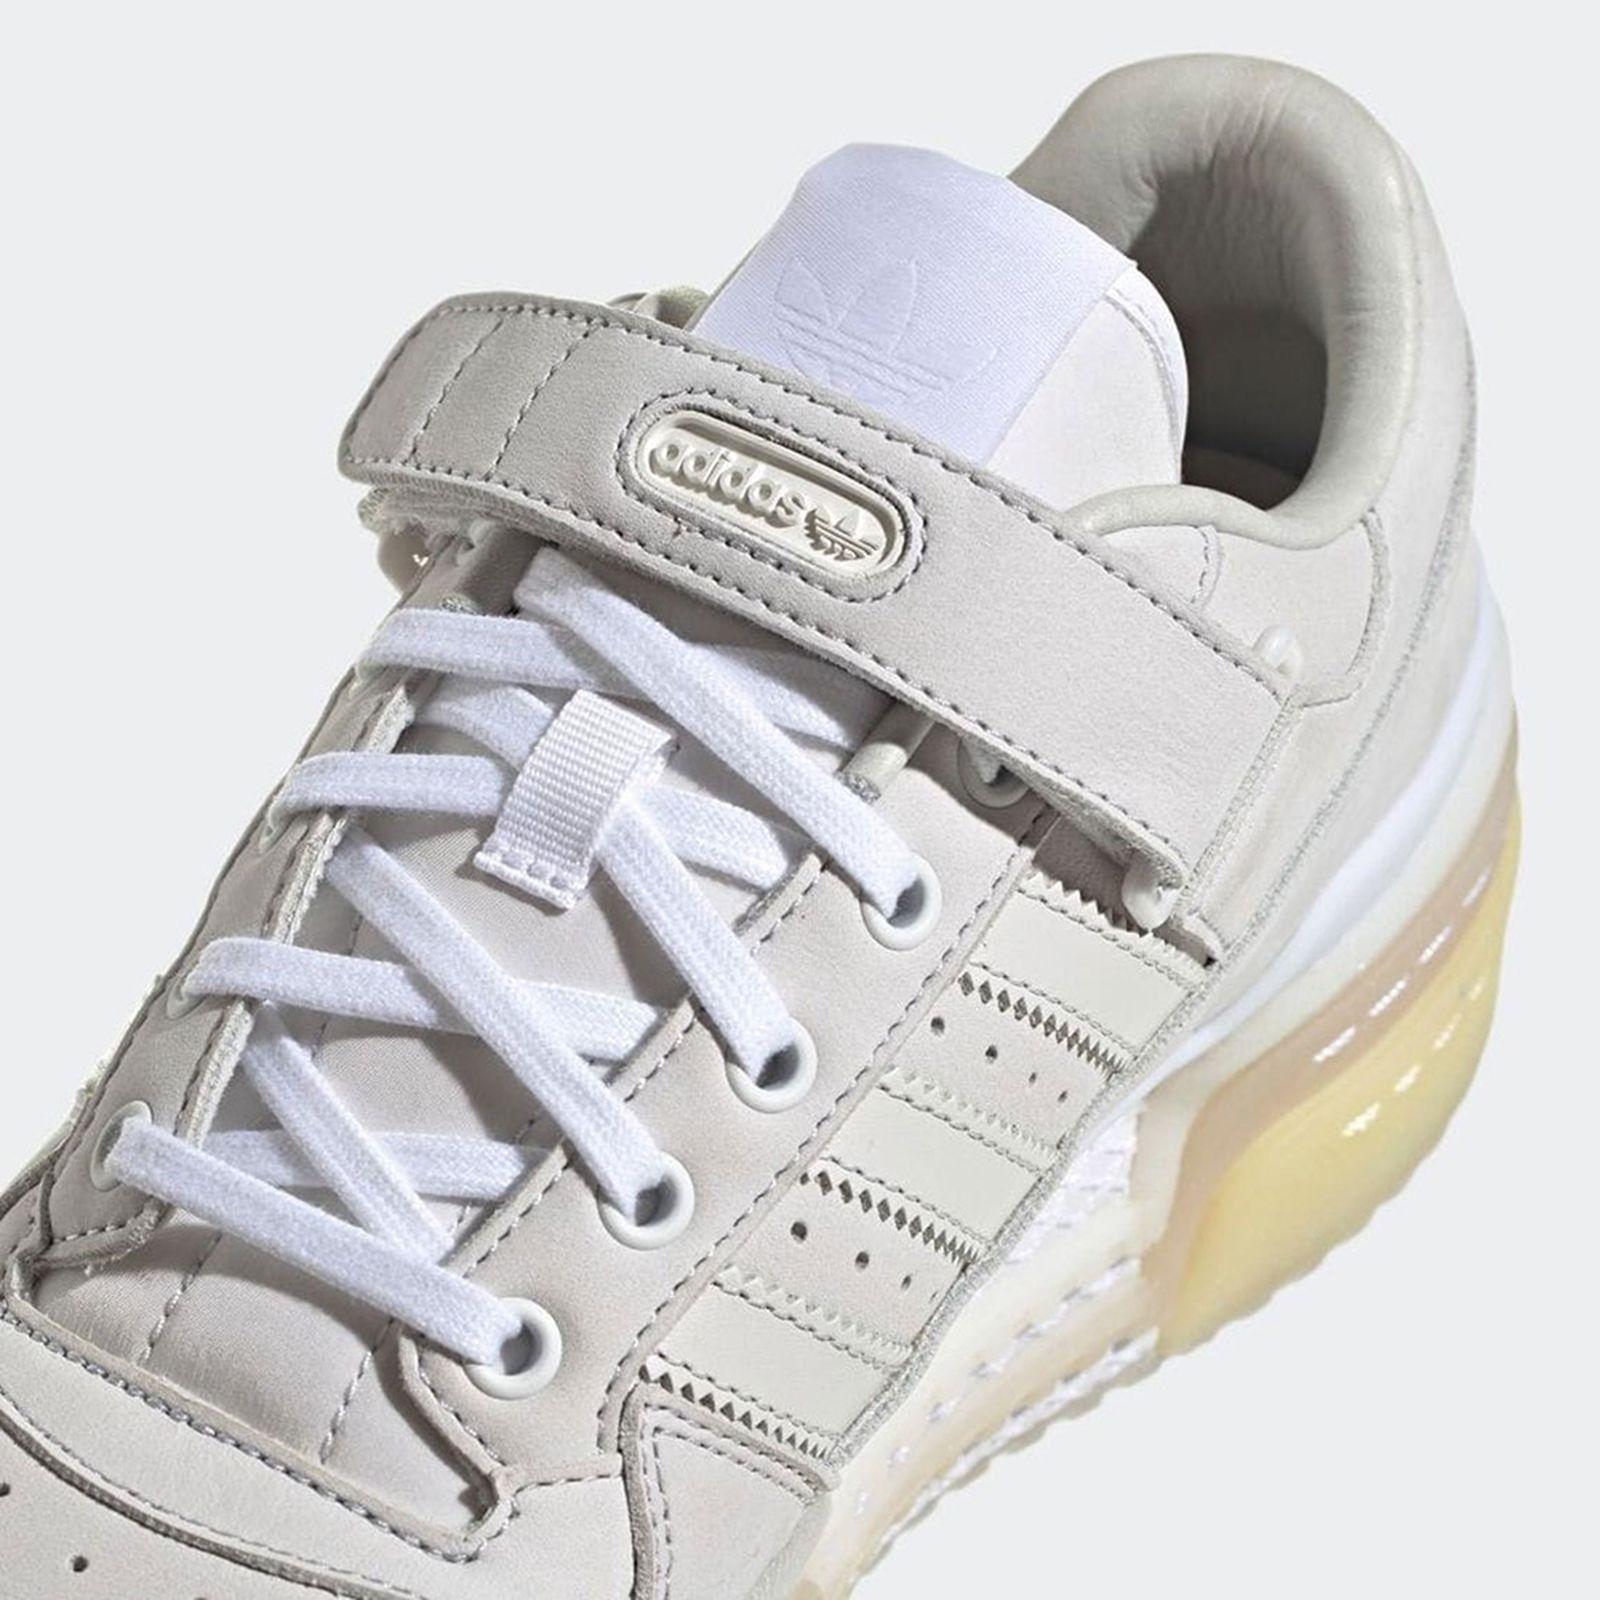 adidas-triple-platforum-lo-crystal-white-release-date-price-05